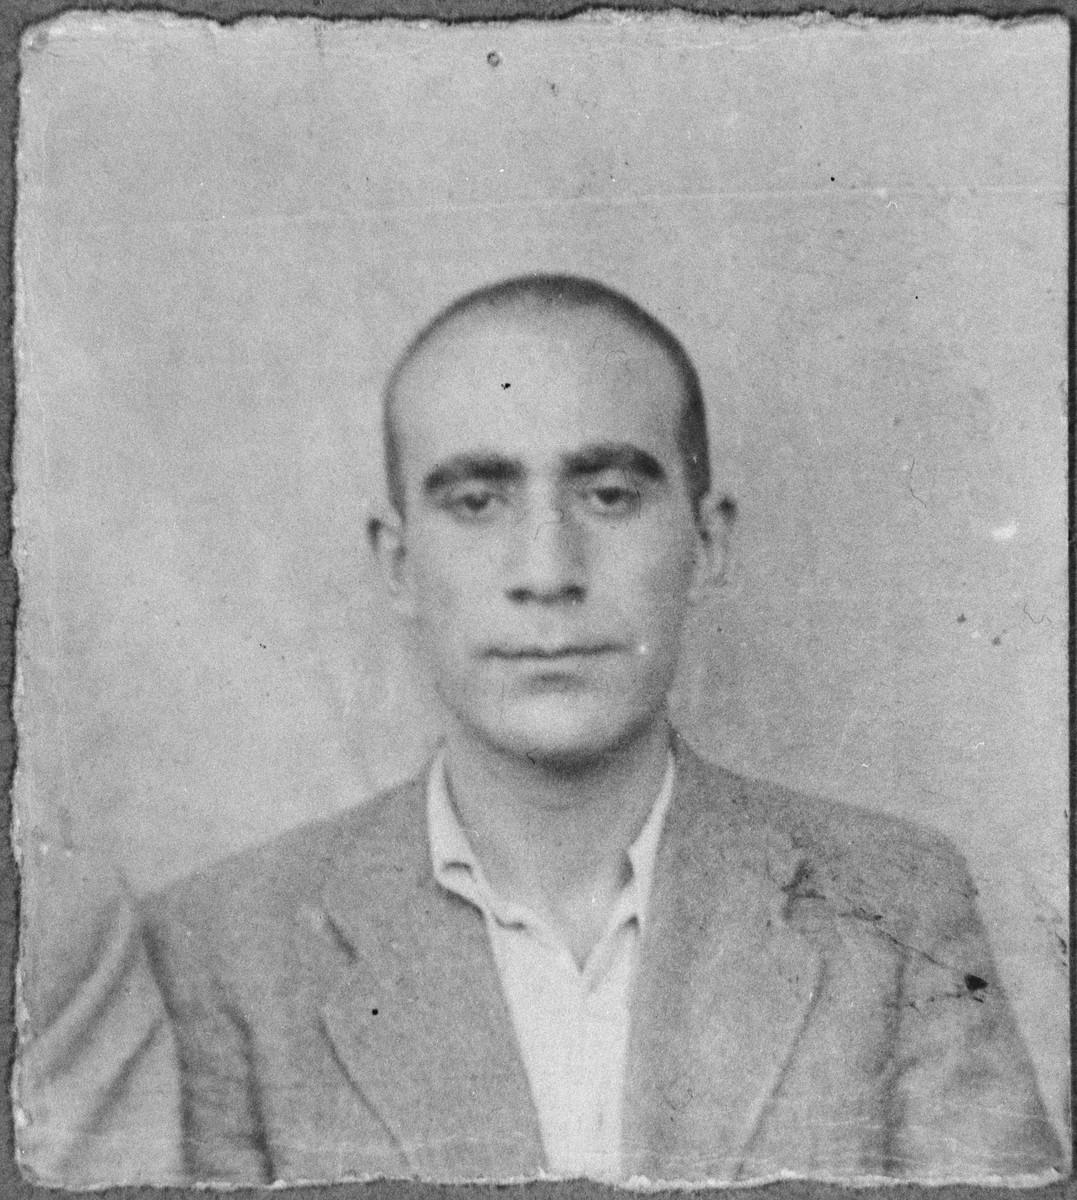 Portrait of Aron Aroesti, son of Avram Aroesti.